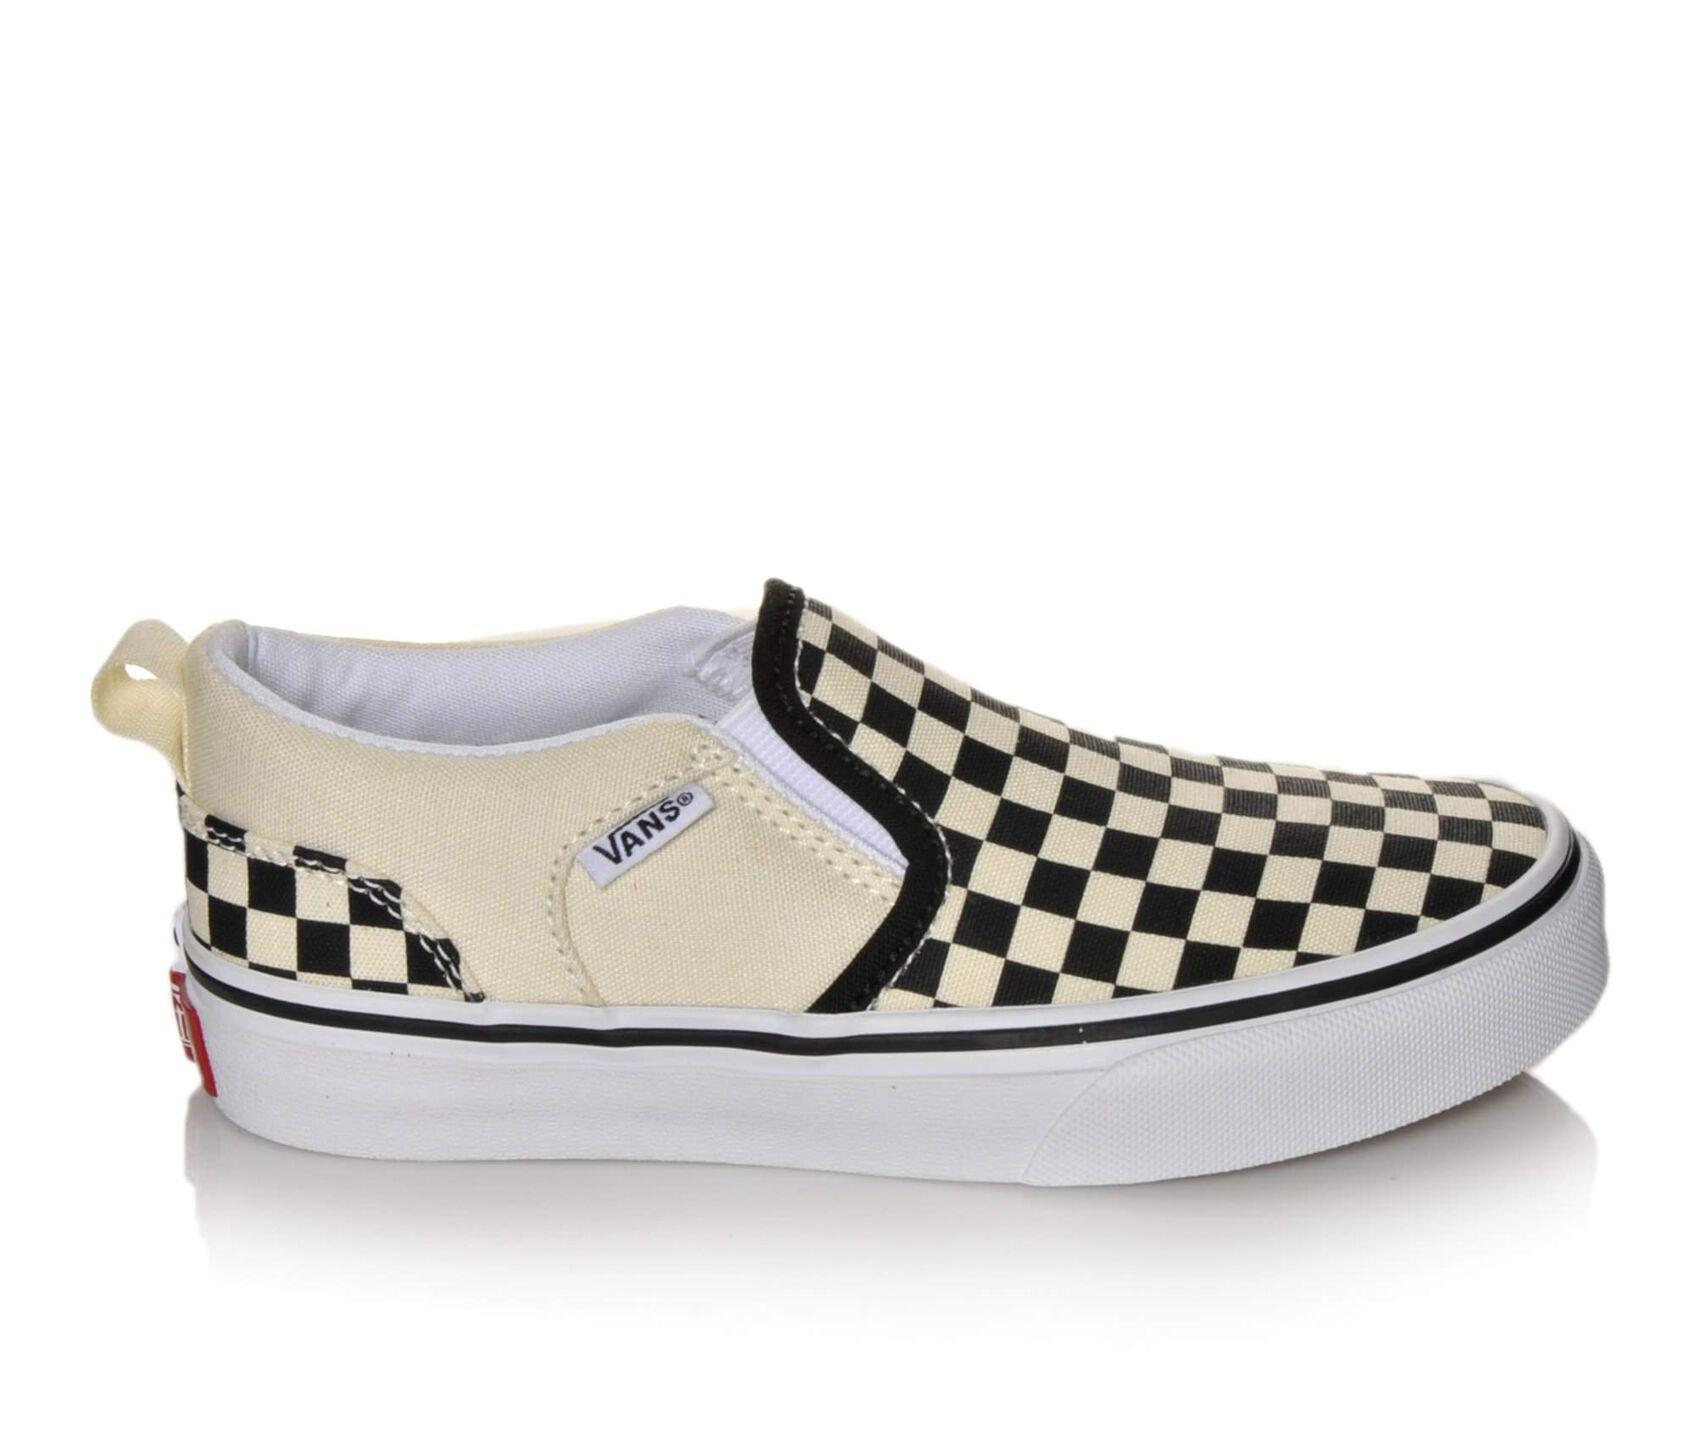 12d063387a56 Boys  Vans Little Kid   Big Kid Asher Slip-On Skate Shoes